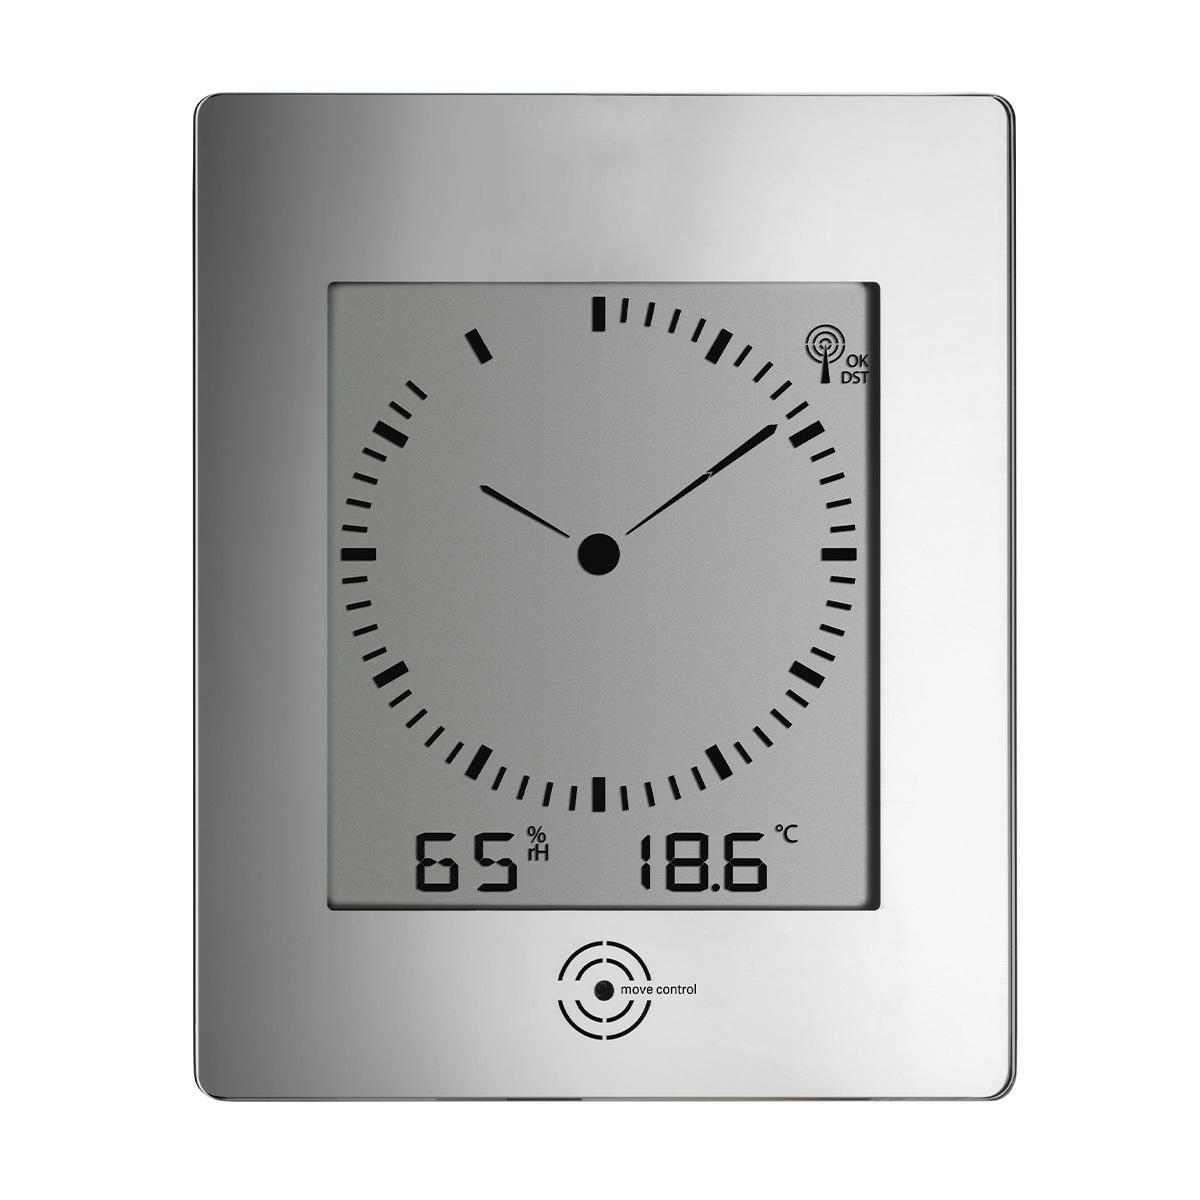 60-4507-digitale-funk-wanduhr-mit-analogem-zifferblatt-raumklima-datum-ansicht3-1200x1200px.jpg